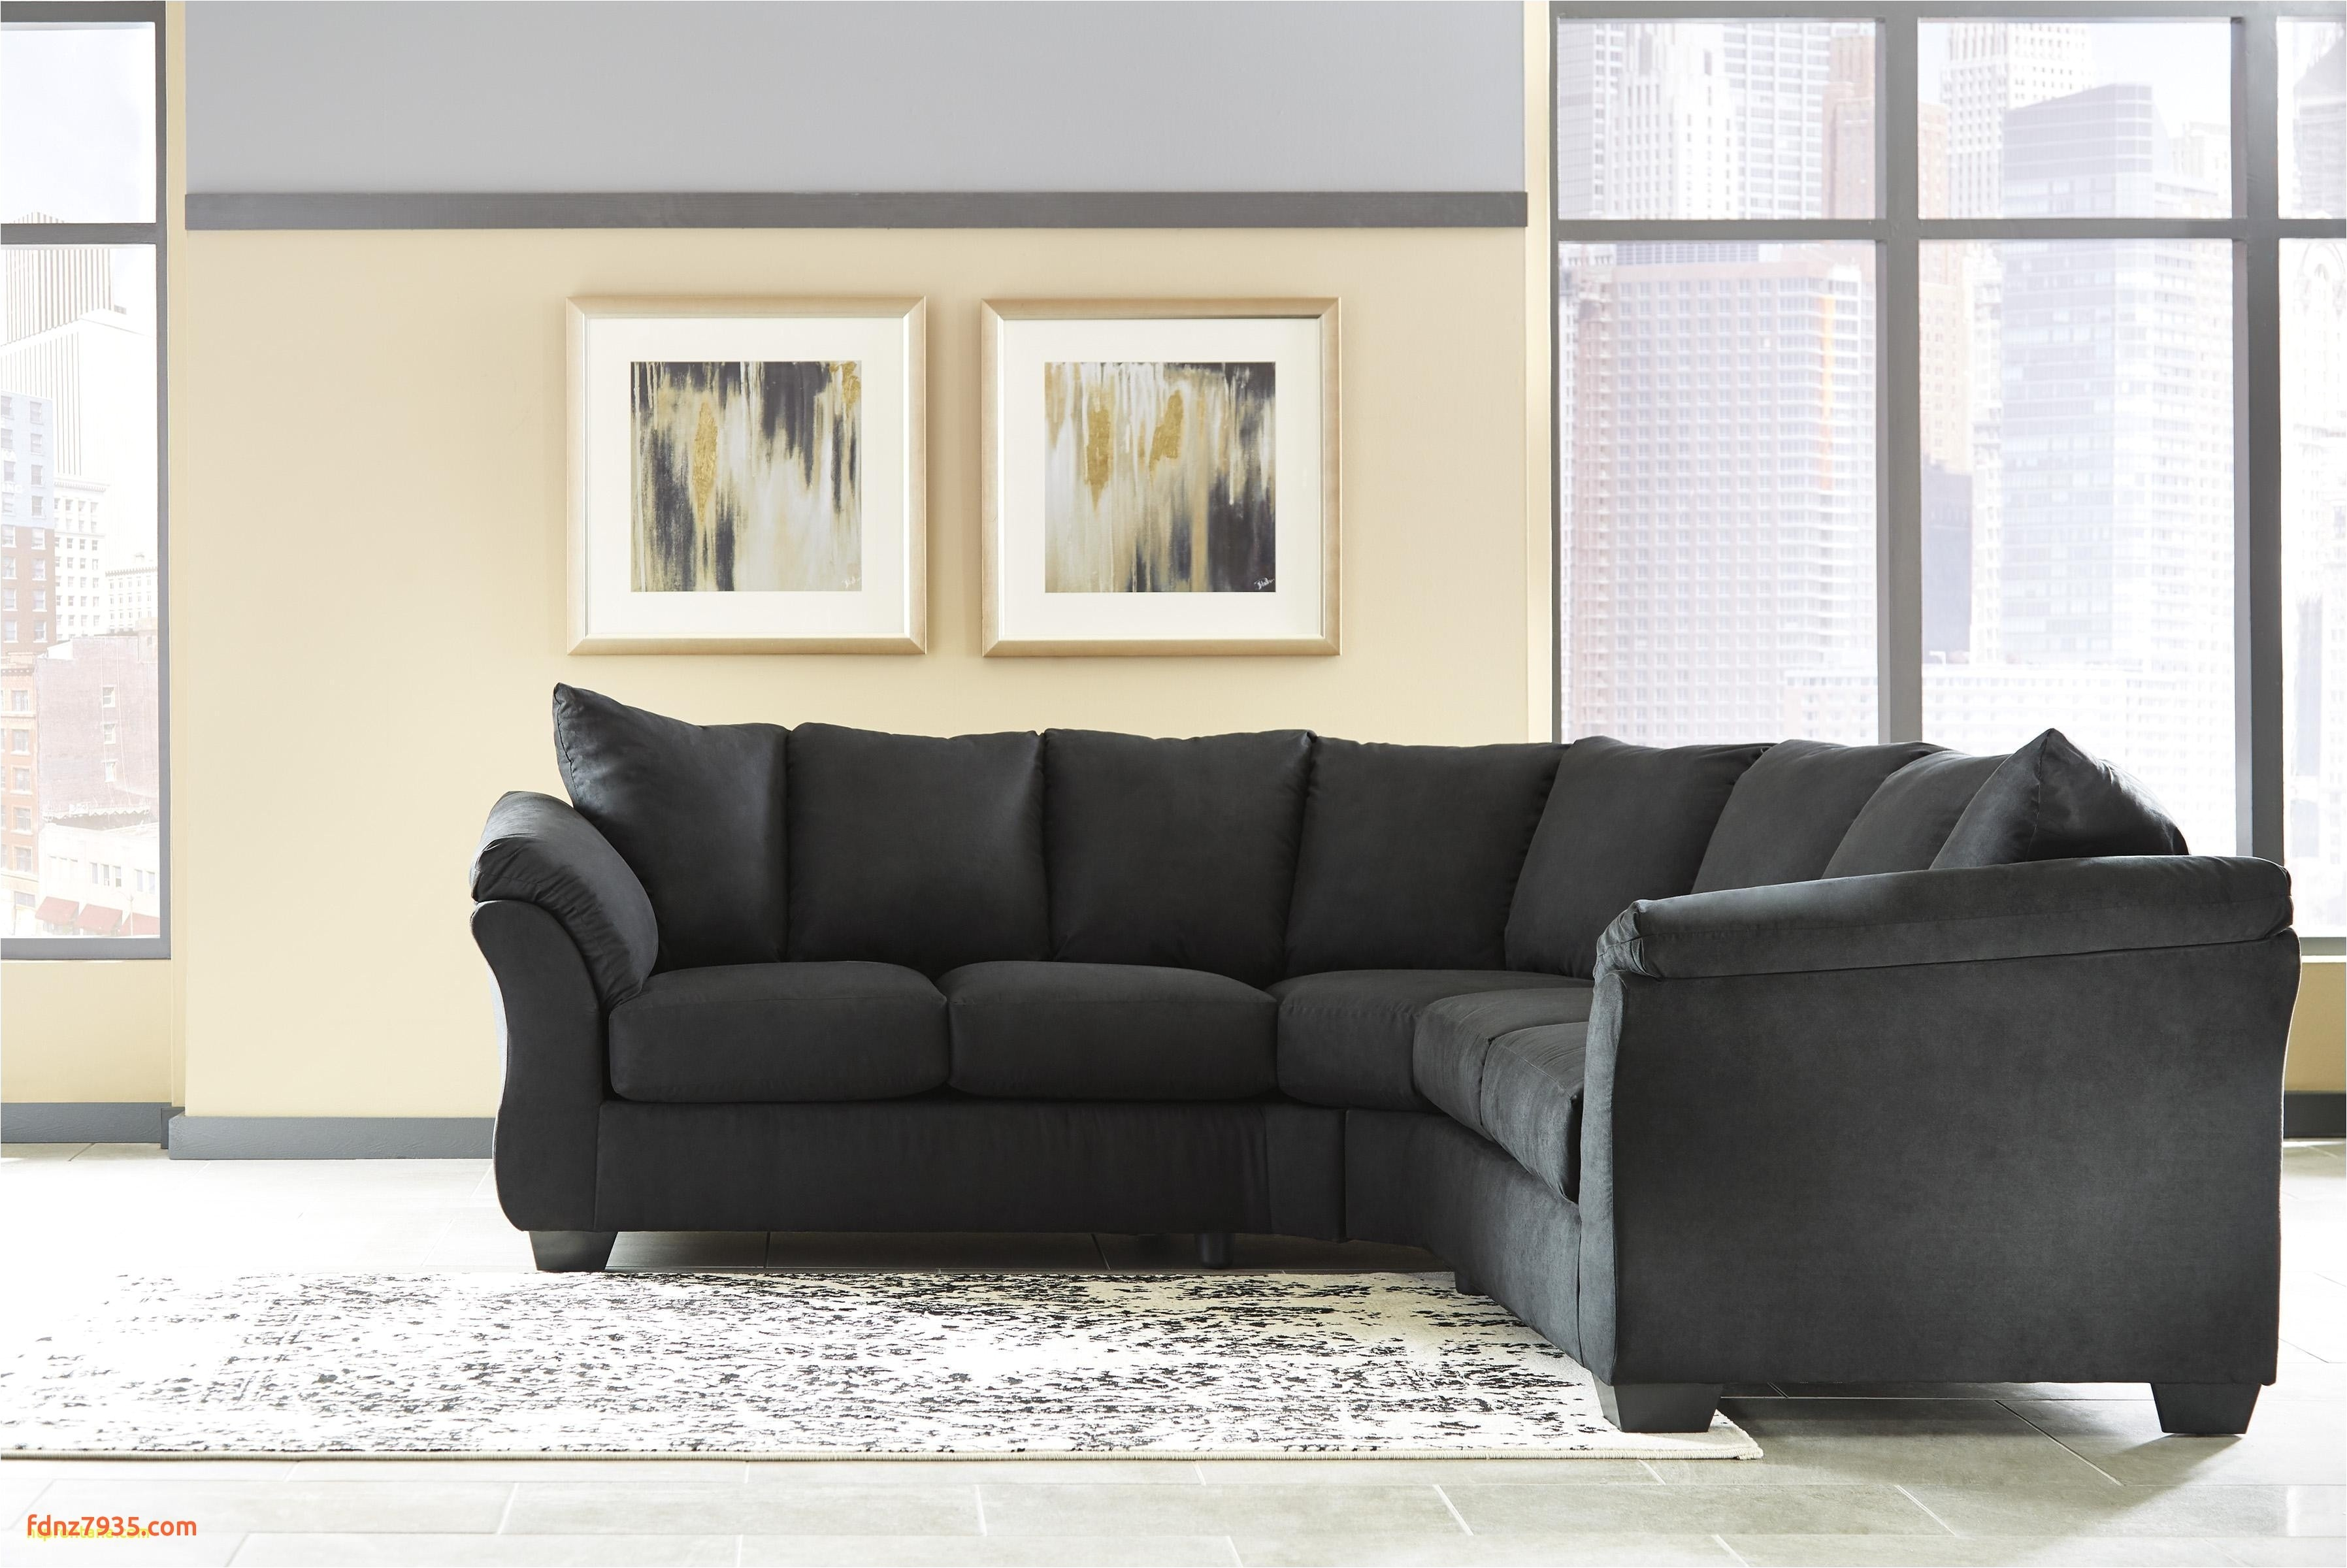 Sectional sofas Under 500.00 Memory Foam Sectional sofa Fresh sofa Design